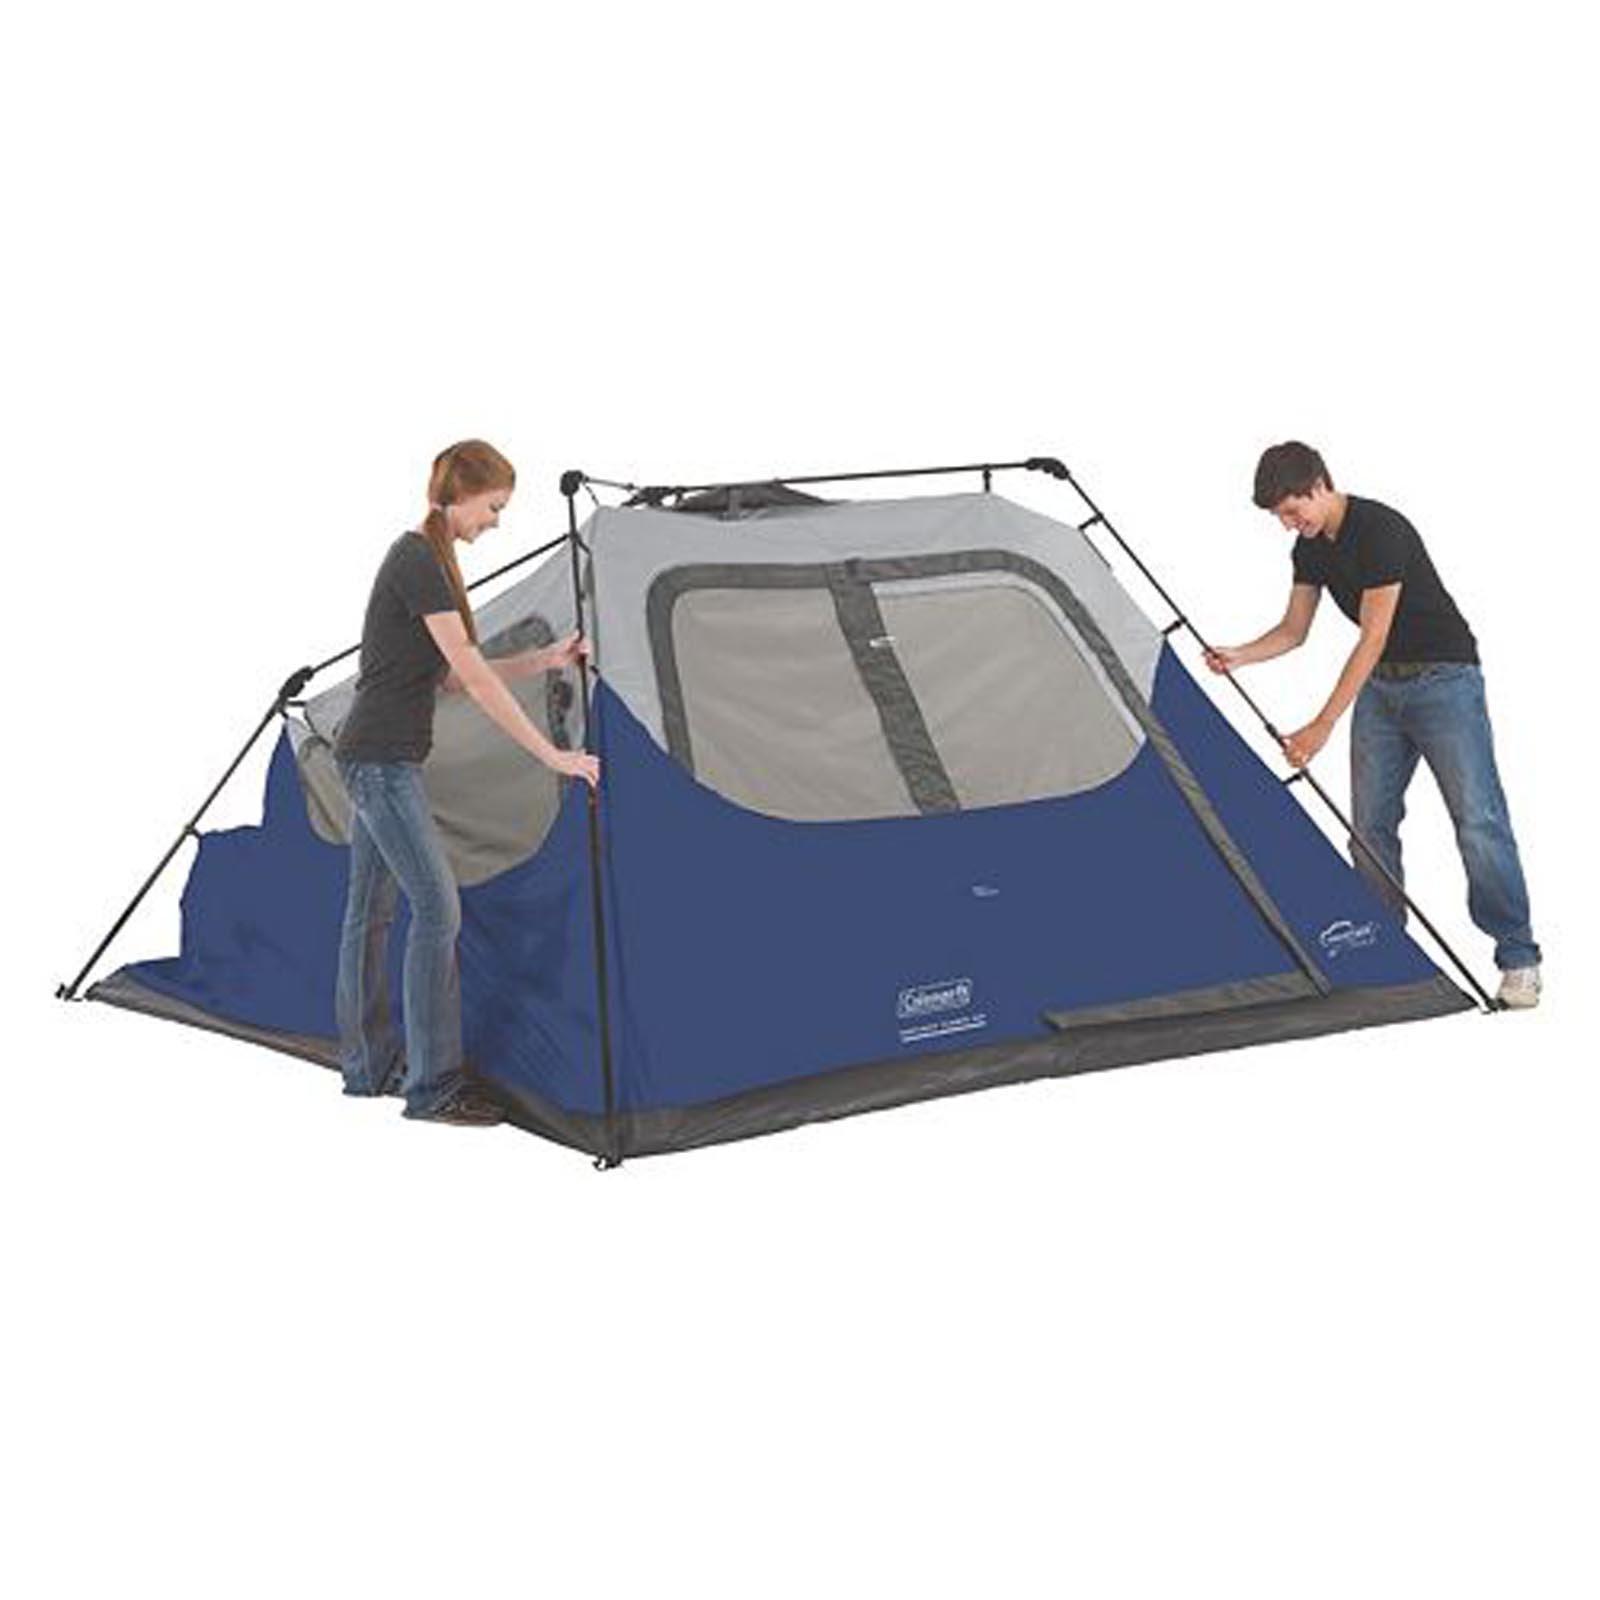 Coleman 6-Person Instant Tent Blue by Coleman (Image #5)